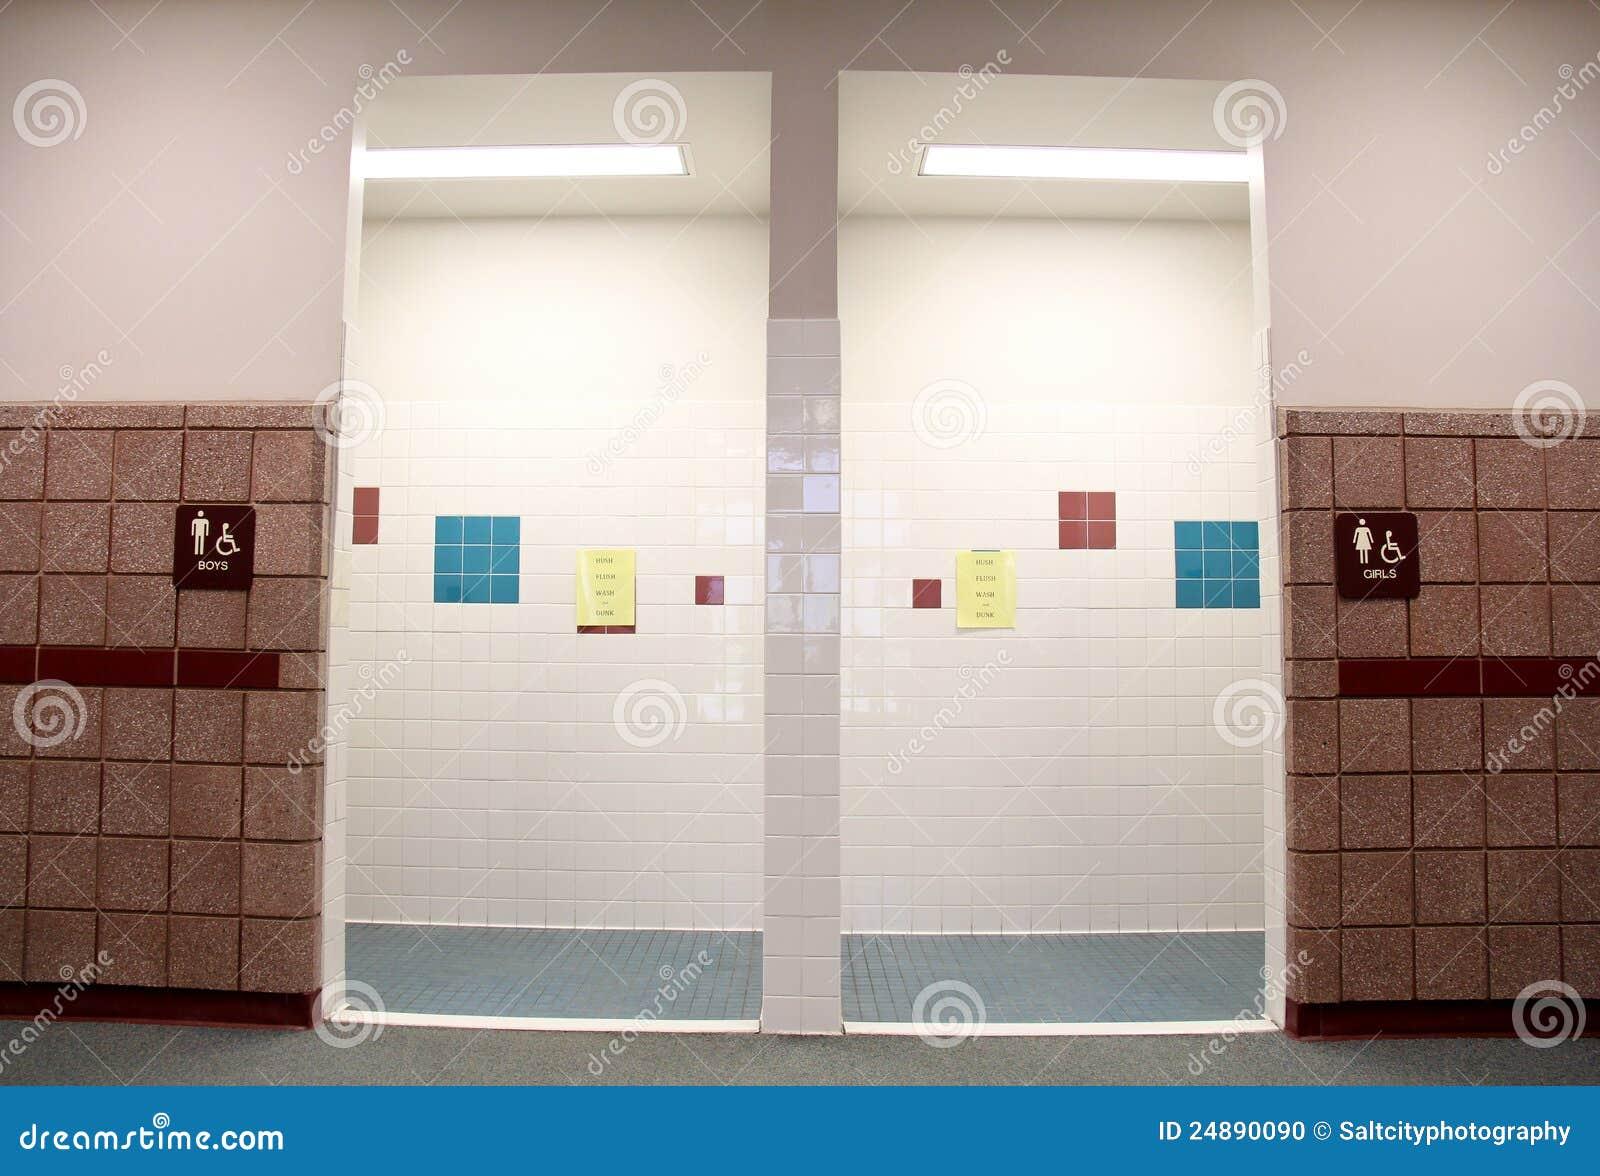 Elementary School Bathroom Design brilliant elementary school bathrooms clipart breathtaking cute